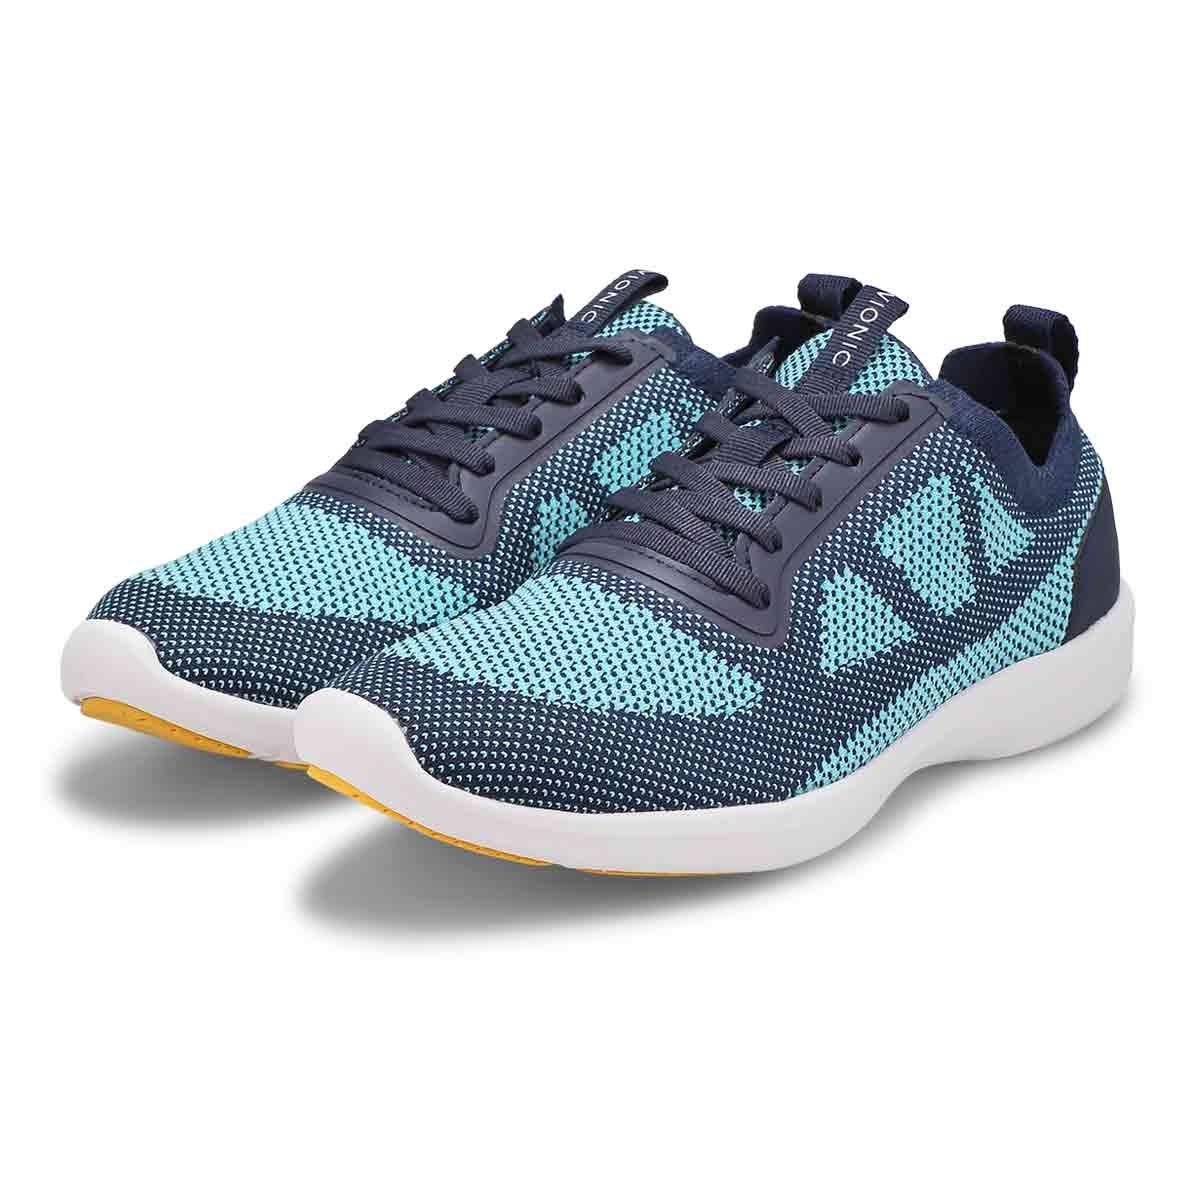 Chaussures de course SKY LENORA, marine, femmes